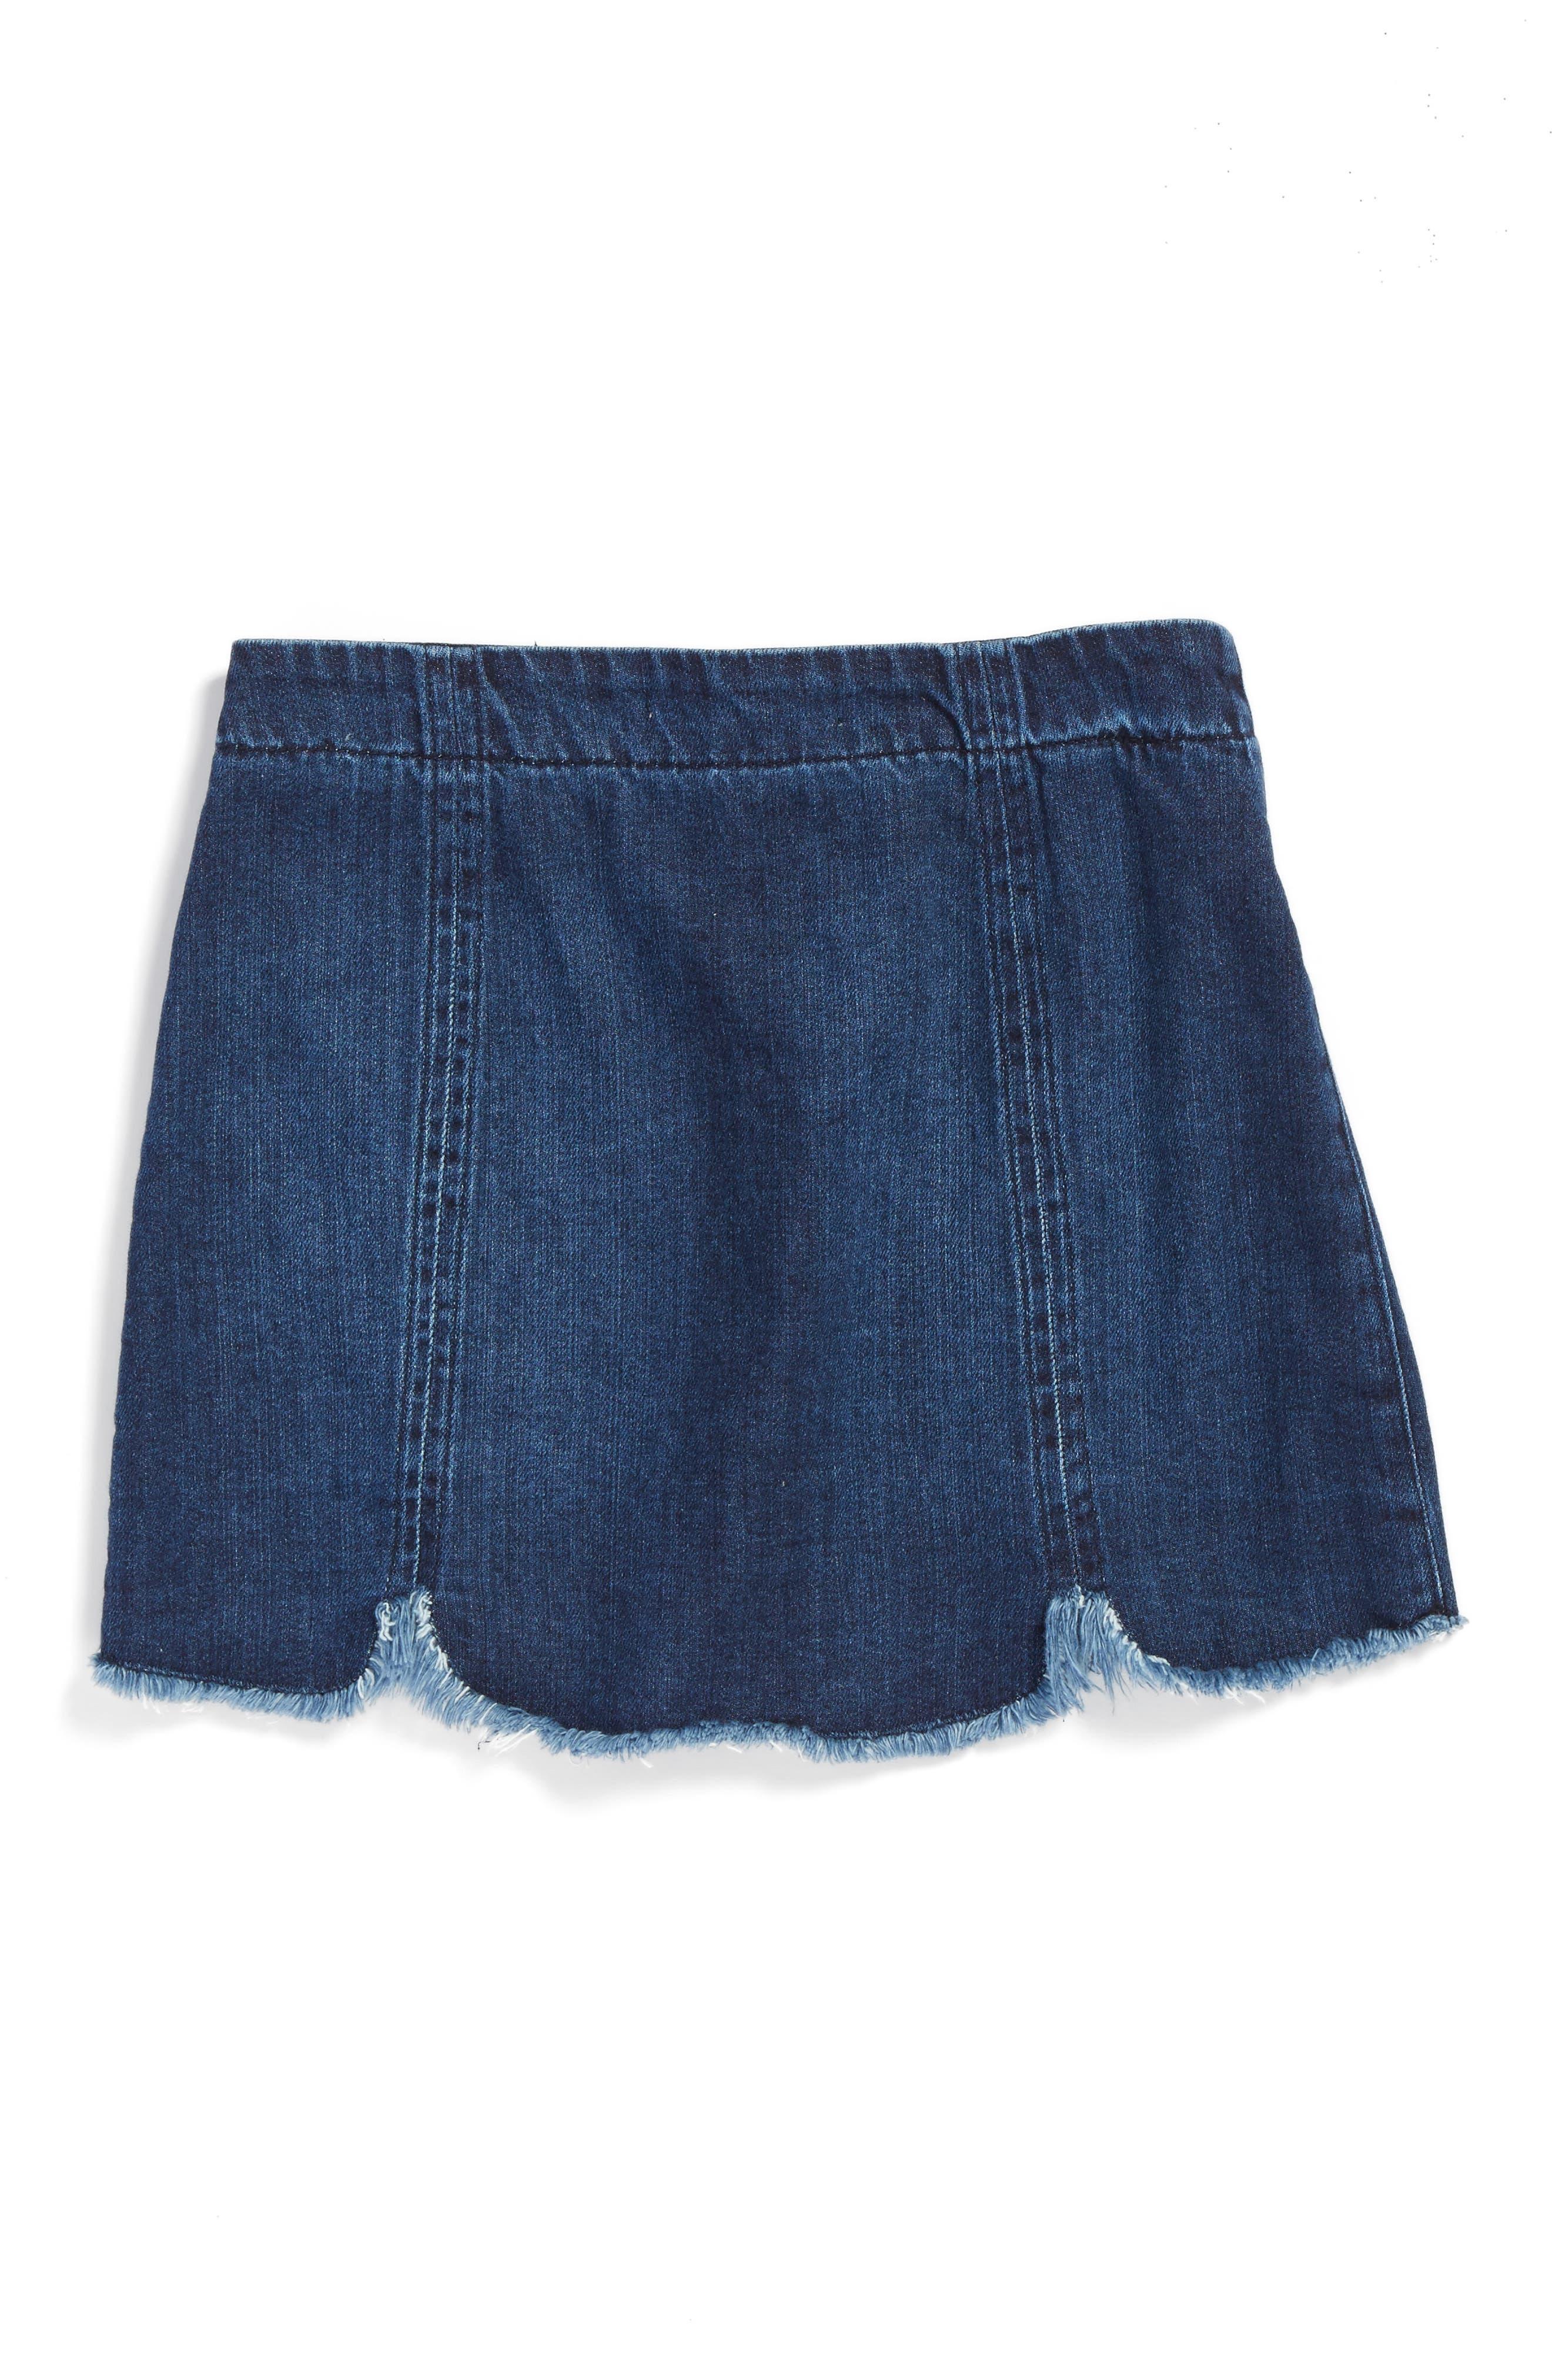 Alternate Image 2  - Tractr Frayed Scallop Denim Skirt (Big Girls)